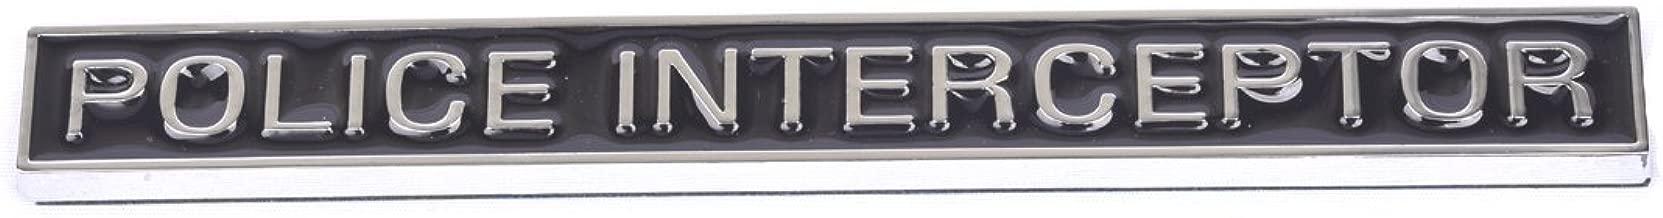 1pc Police Interceptor emblems, 3D emblems Trunk Sticker Decal Sticker Replacement for Explorer Car Accessories Black